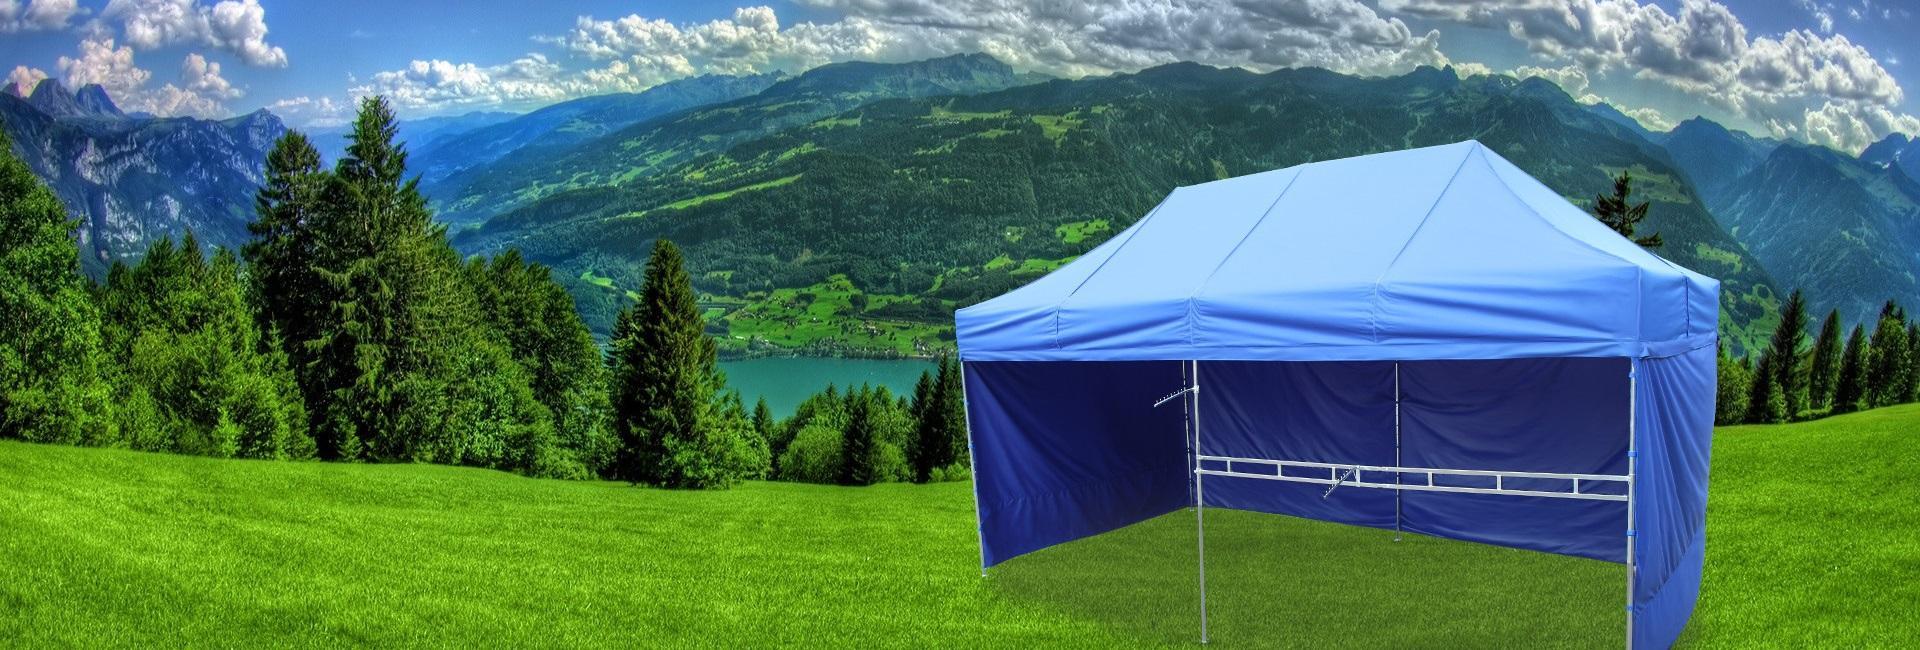 Modernistyczne Gralech – namioty handlowe producent | namioty ekspresowe NG82